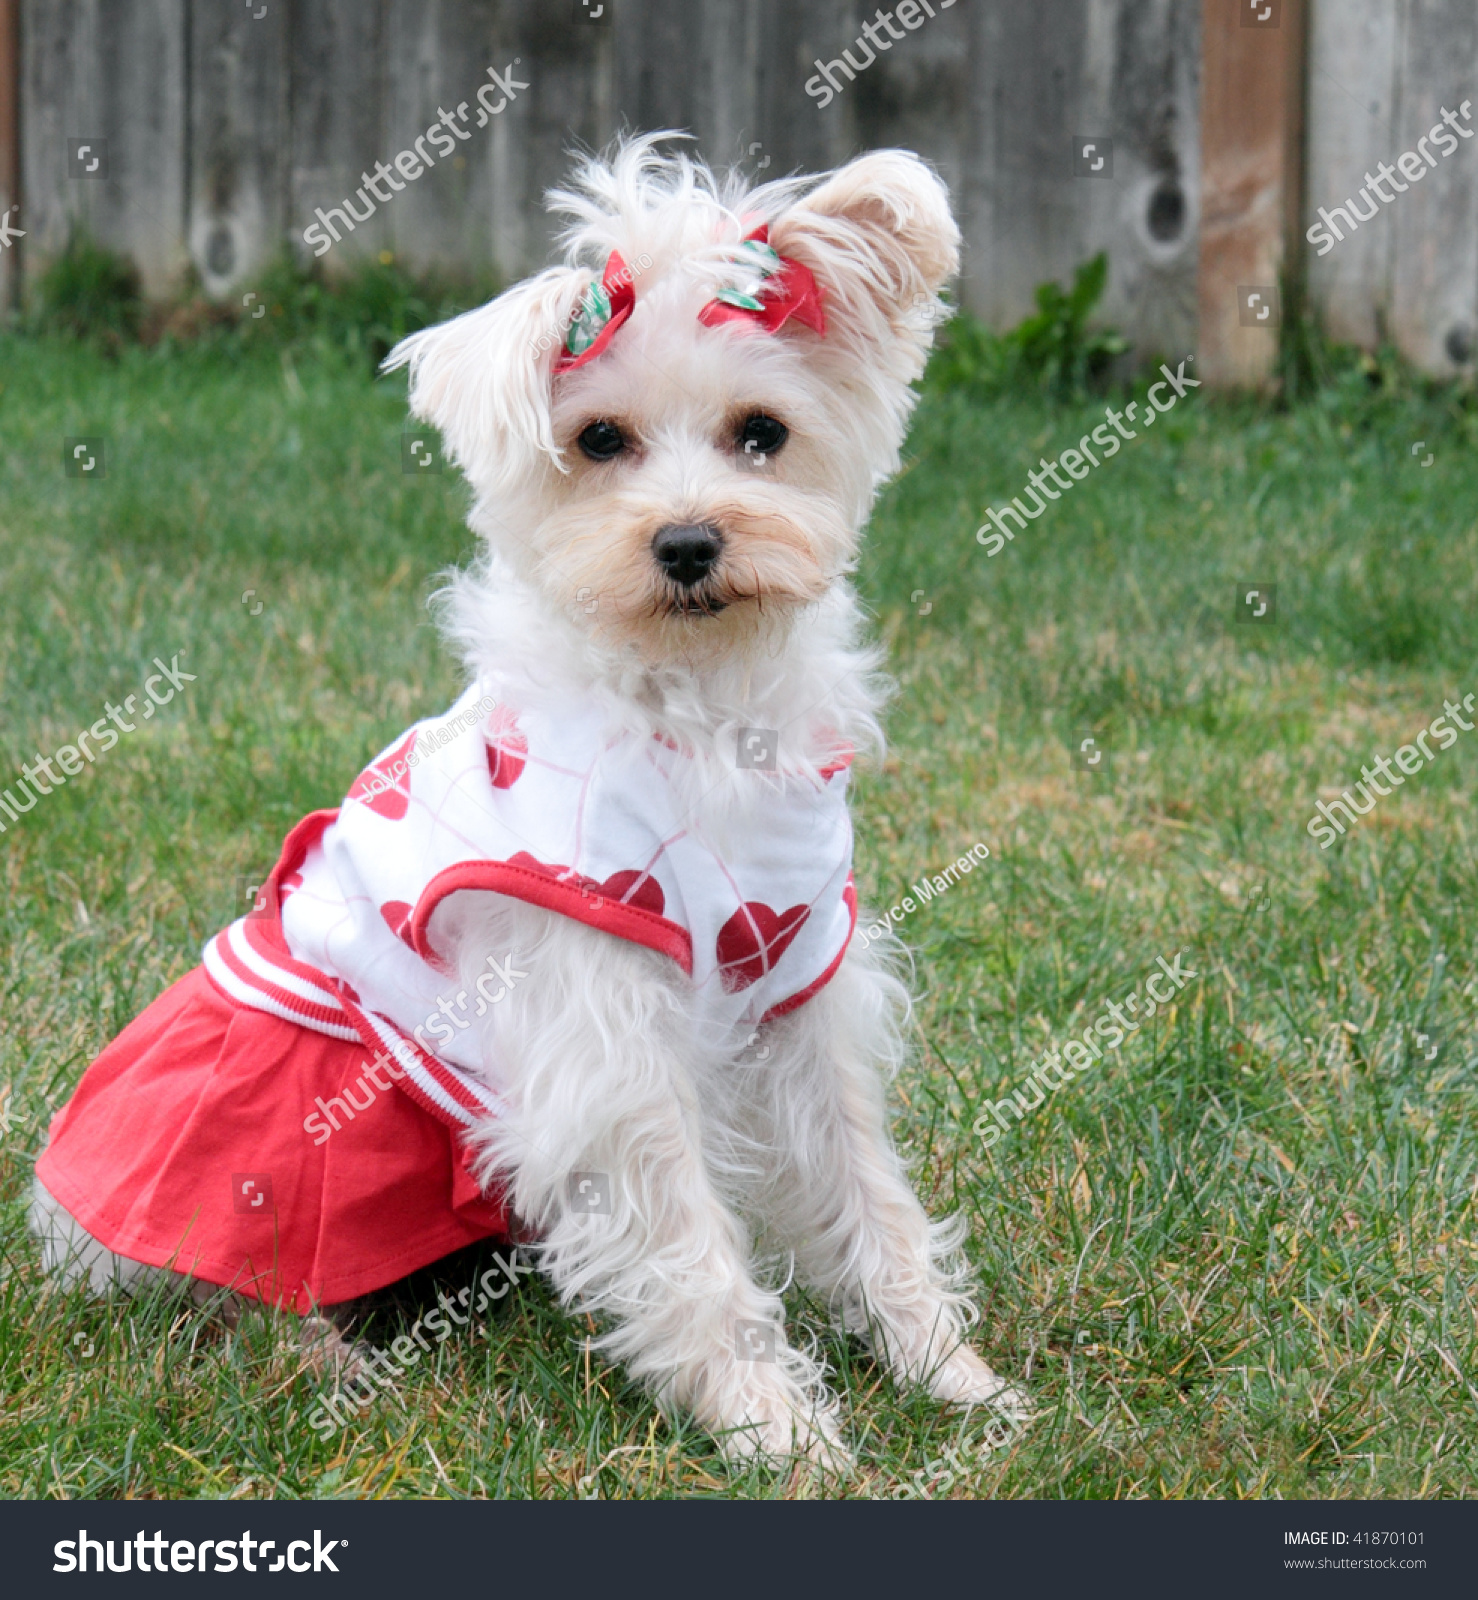 Cute White Toy Dogs - Noten Animals